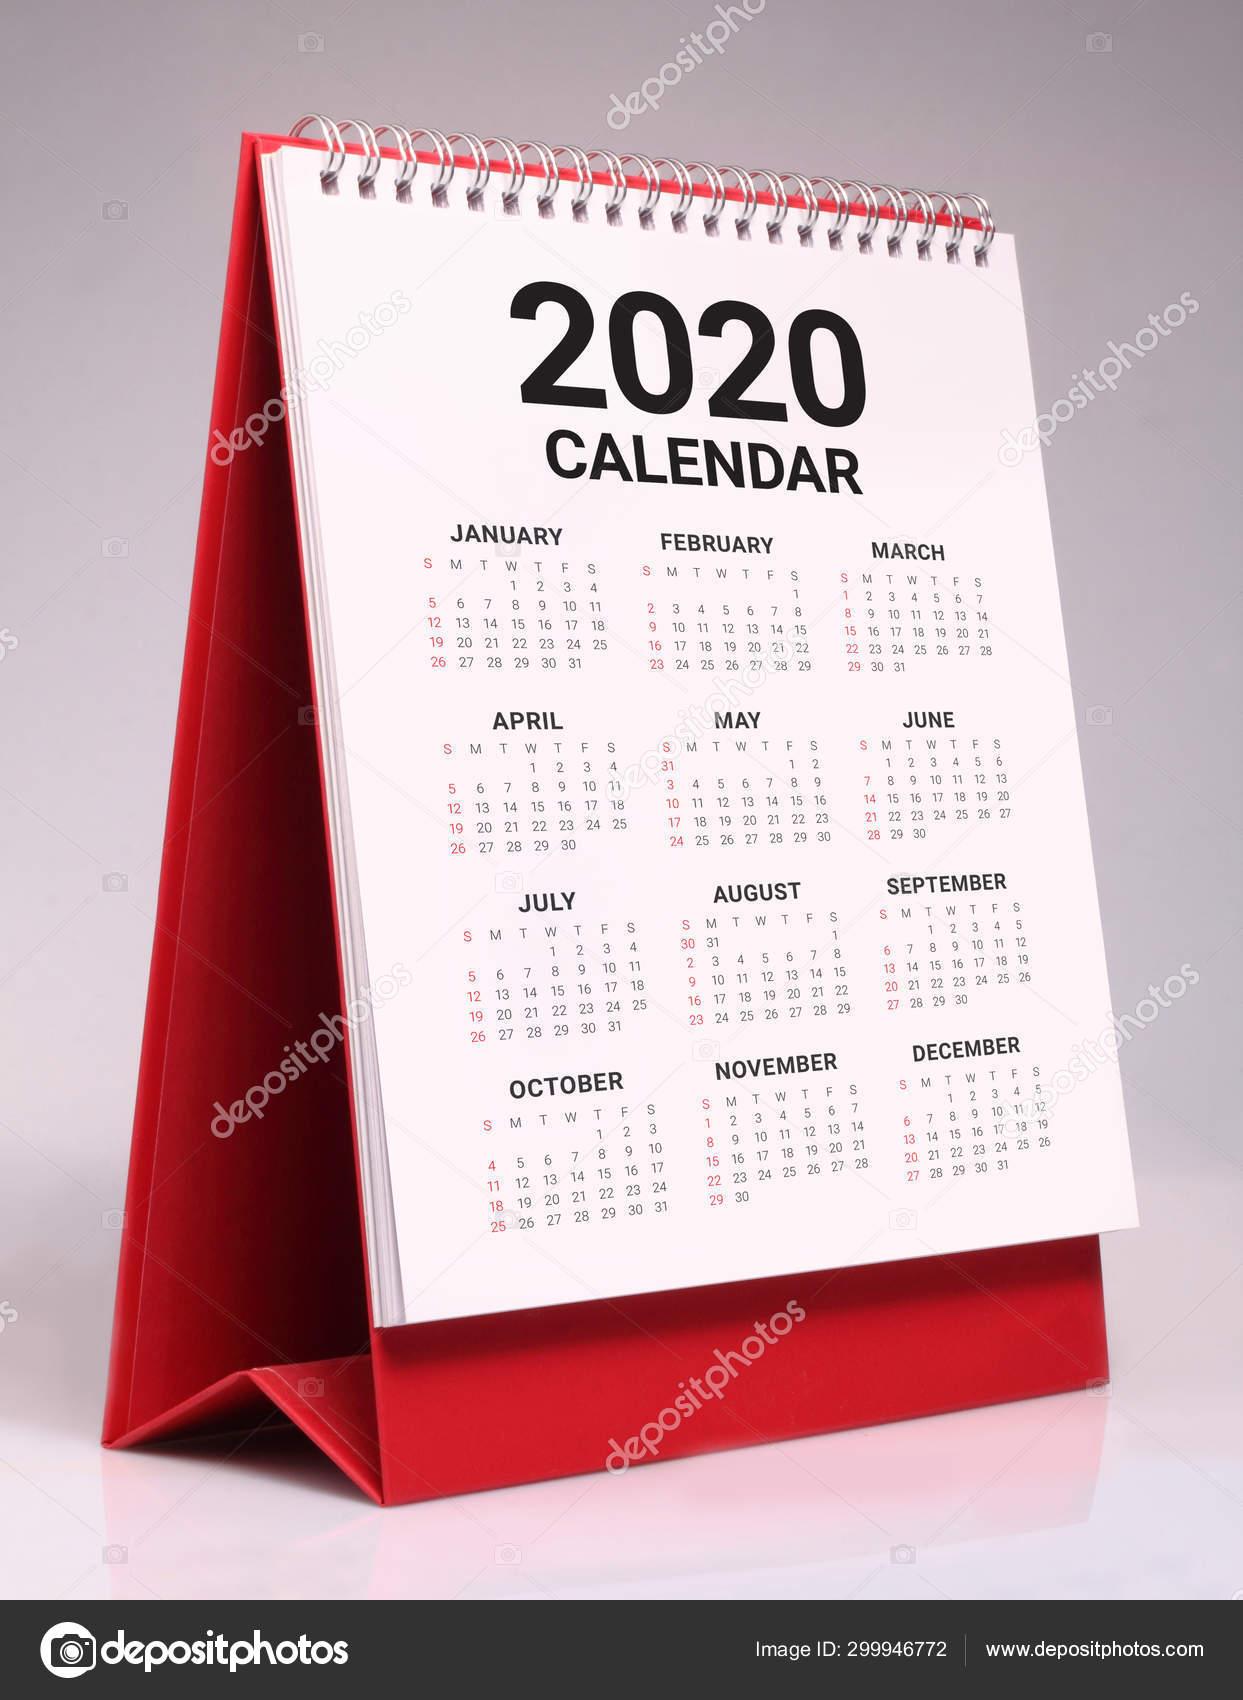 Calendario Da Scrivania 2020.Calendario Da Tavolo Semplice 2020 Foto Stock